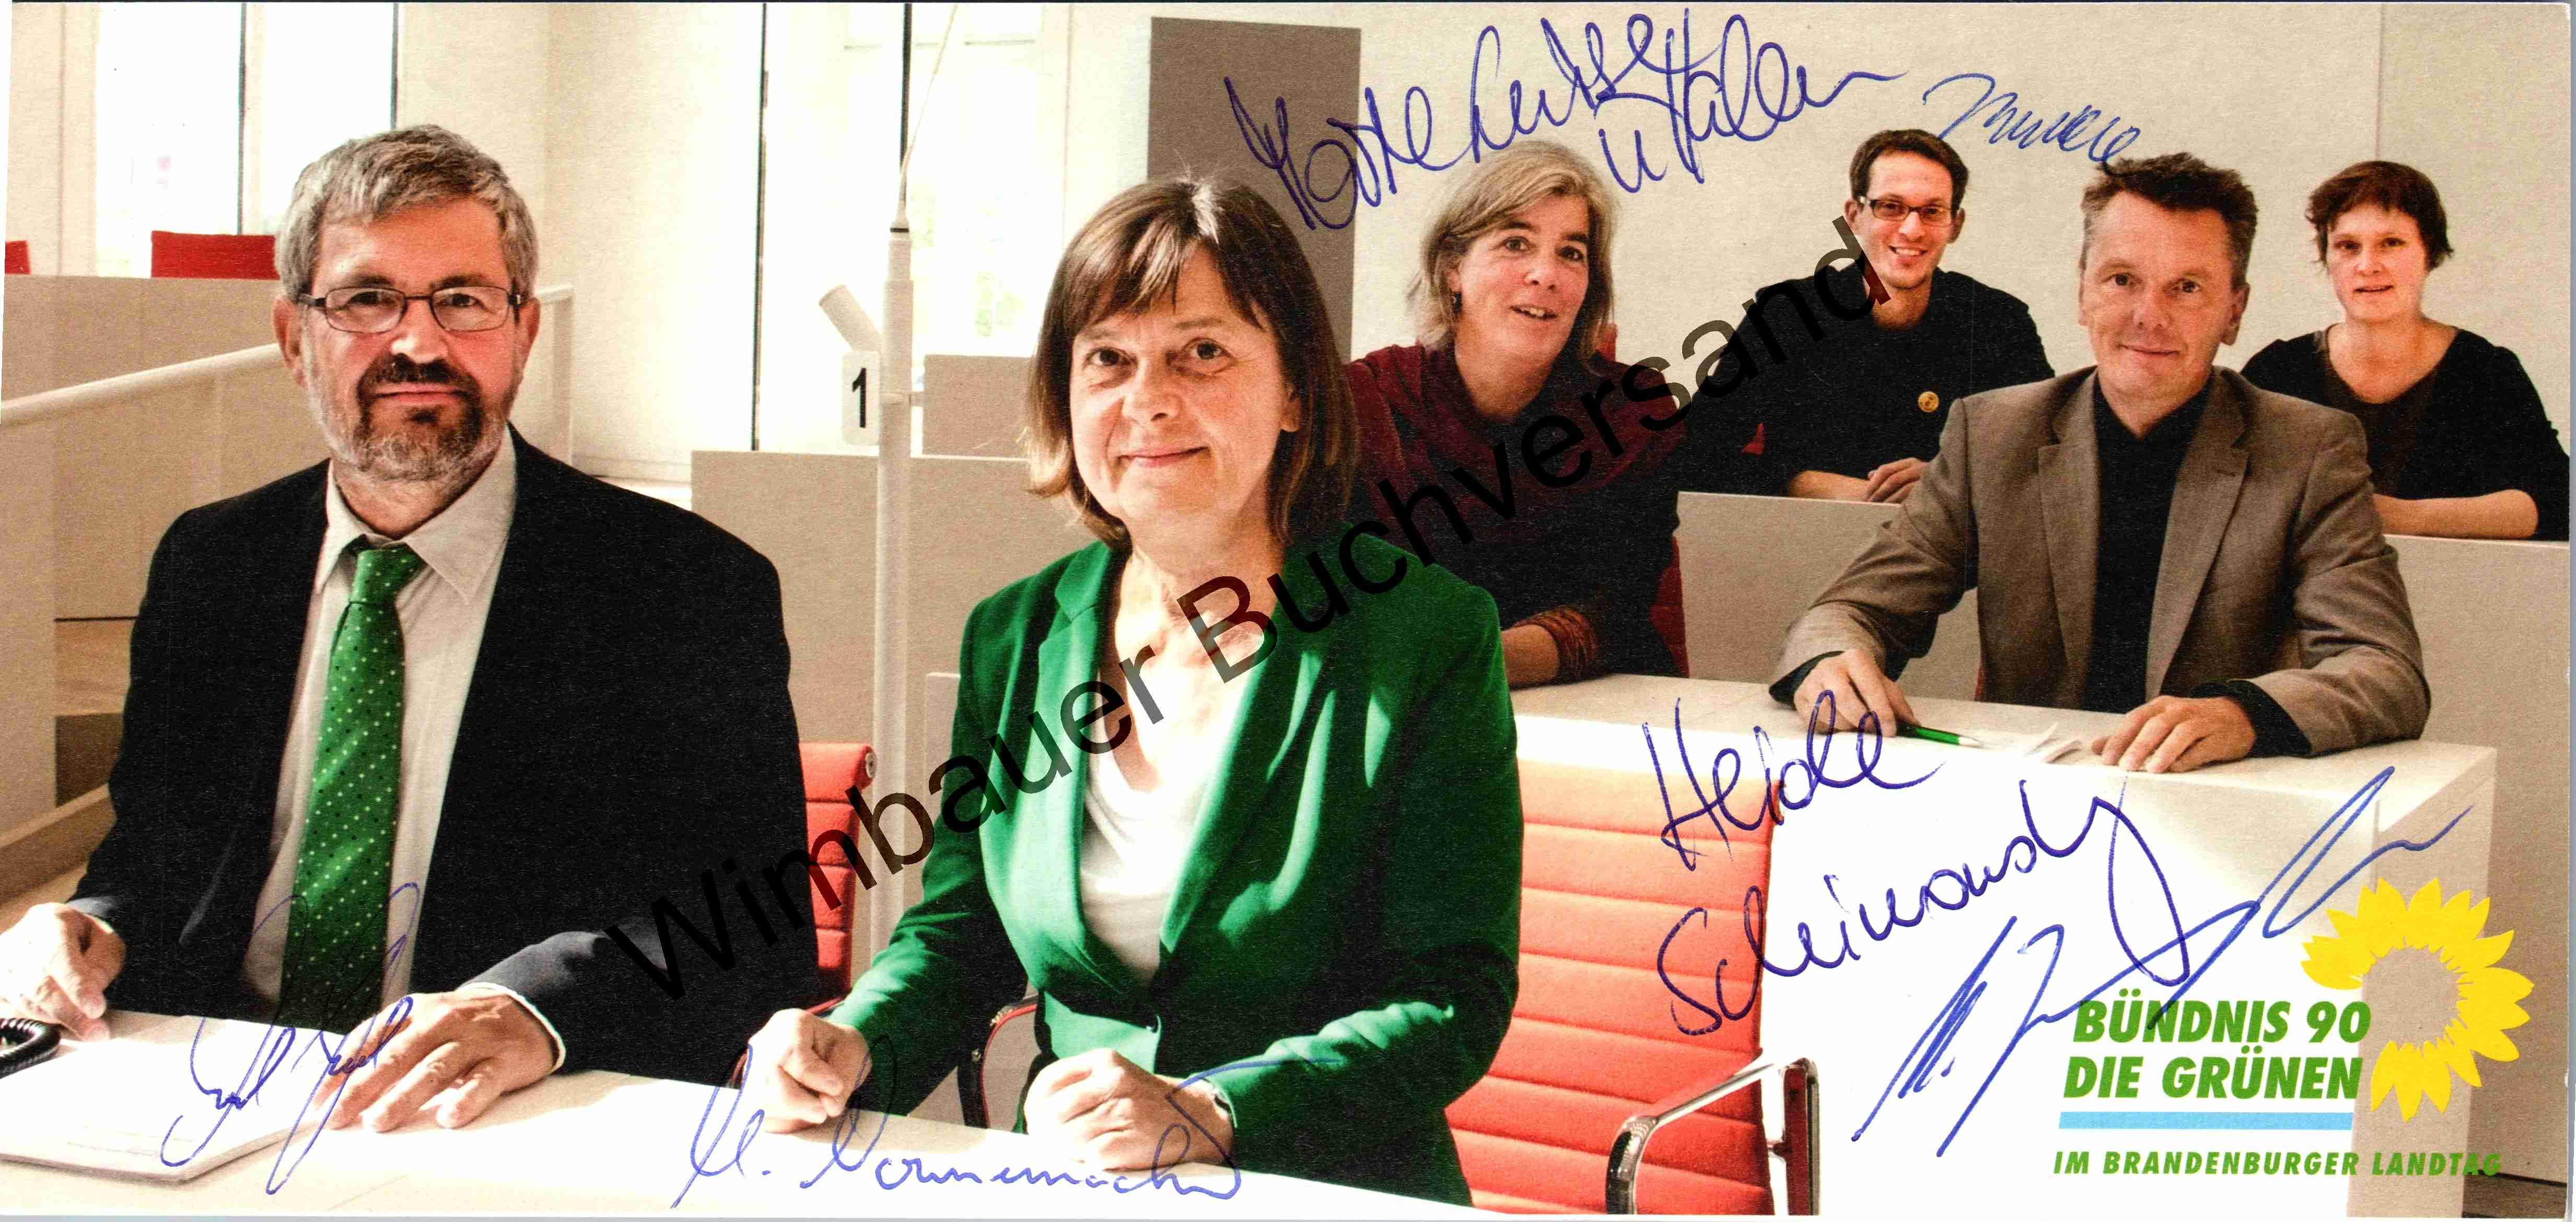 Original Autogramme Die Grünen Landtagsfraktion Brandenburg /// Autogramm Autograph signiert signed signee